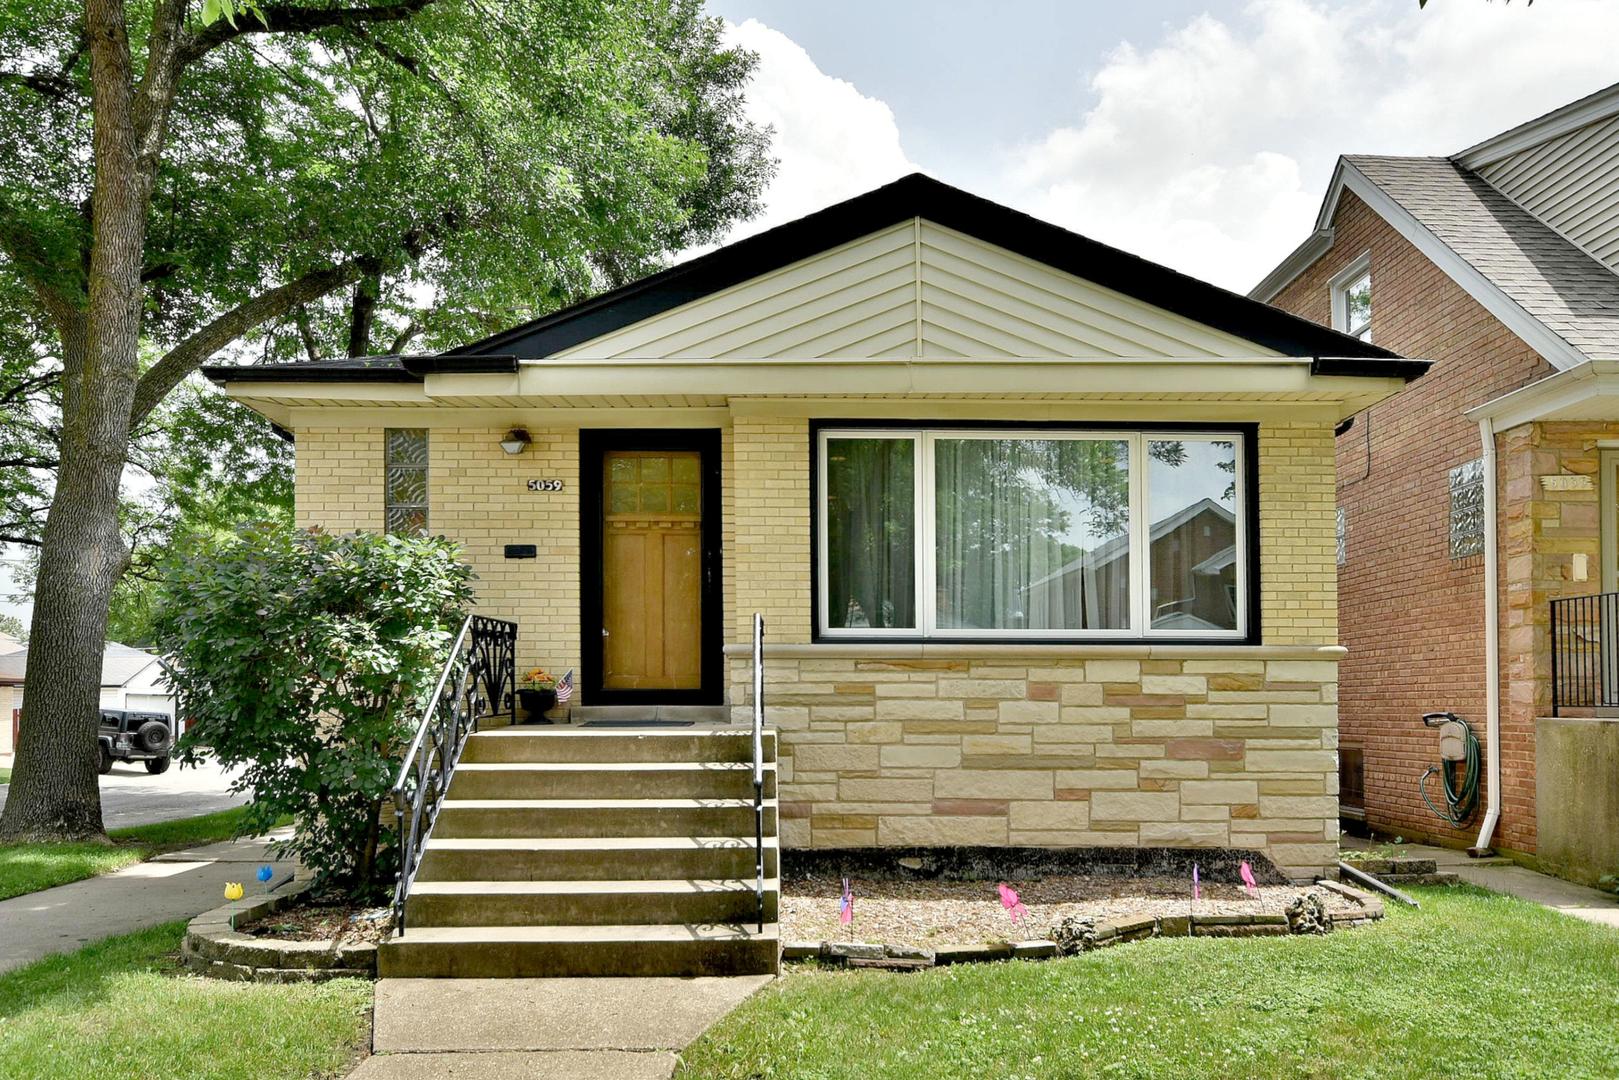 5059 N Oak Park Exterior Photo